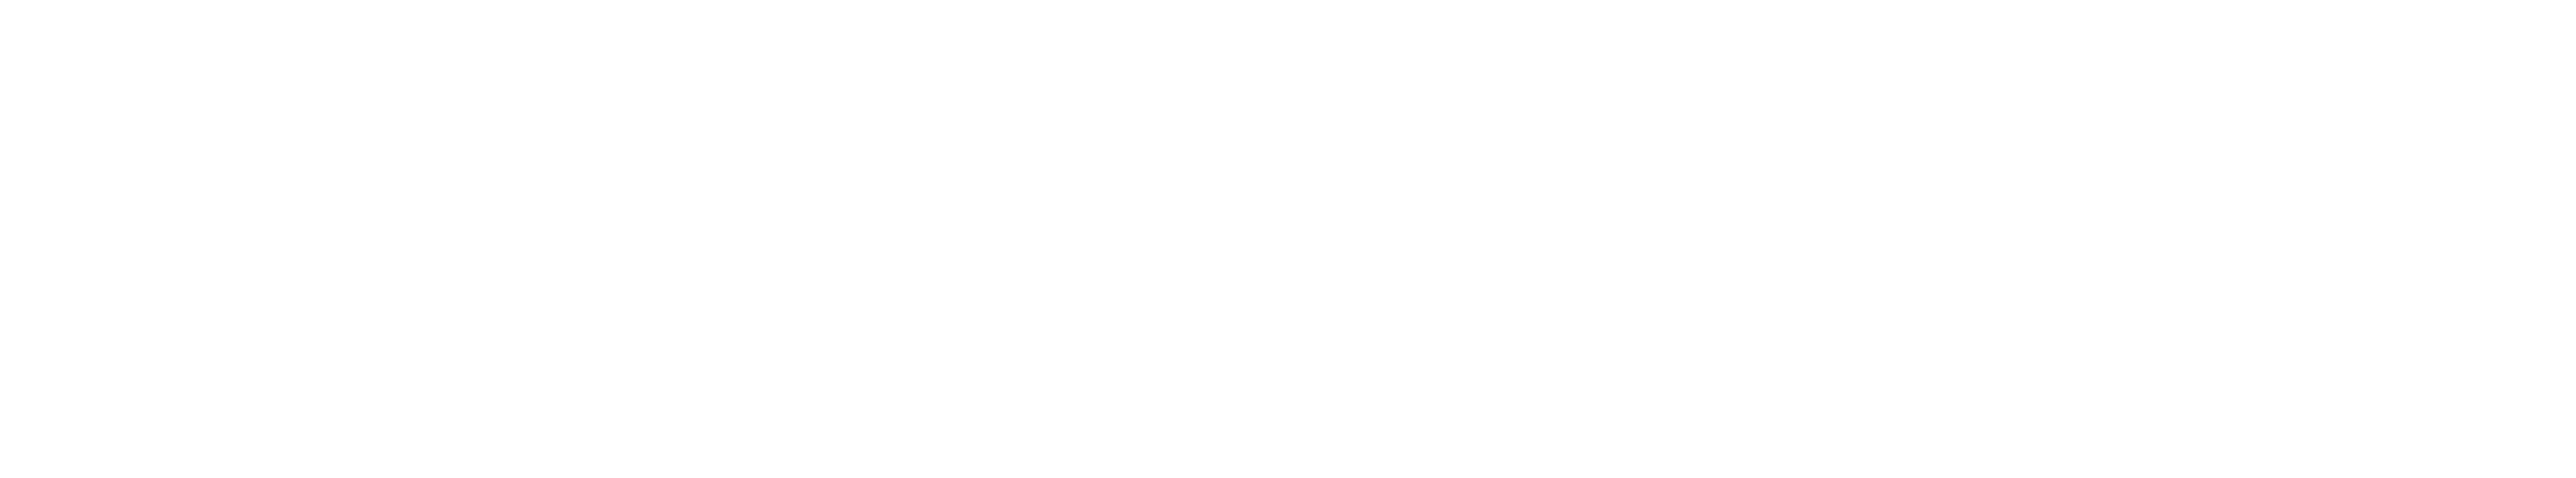 Ruet Joël Élagage